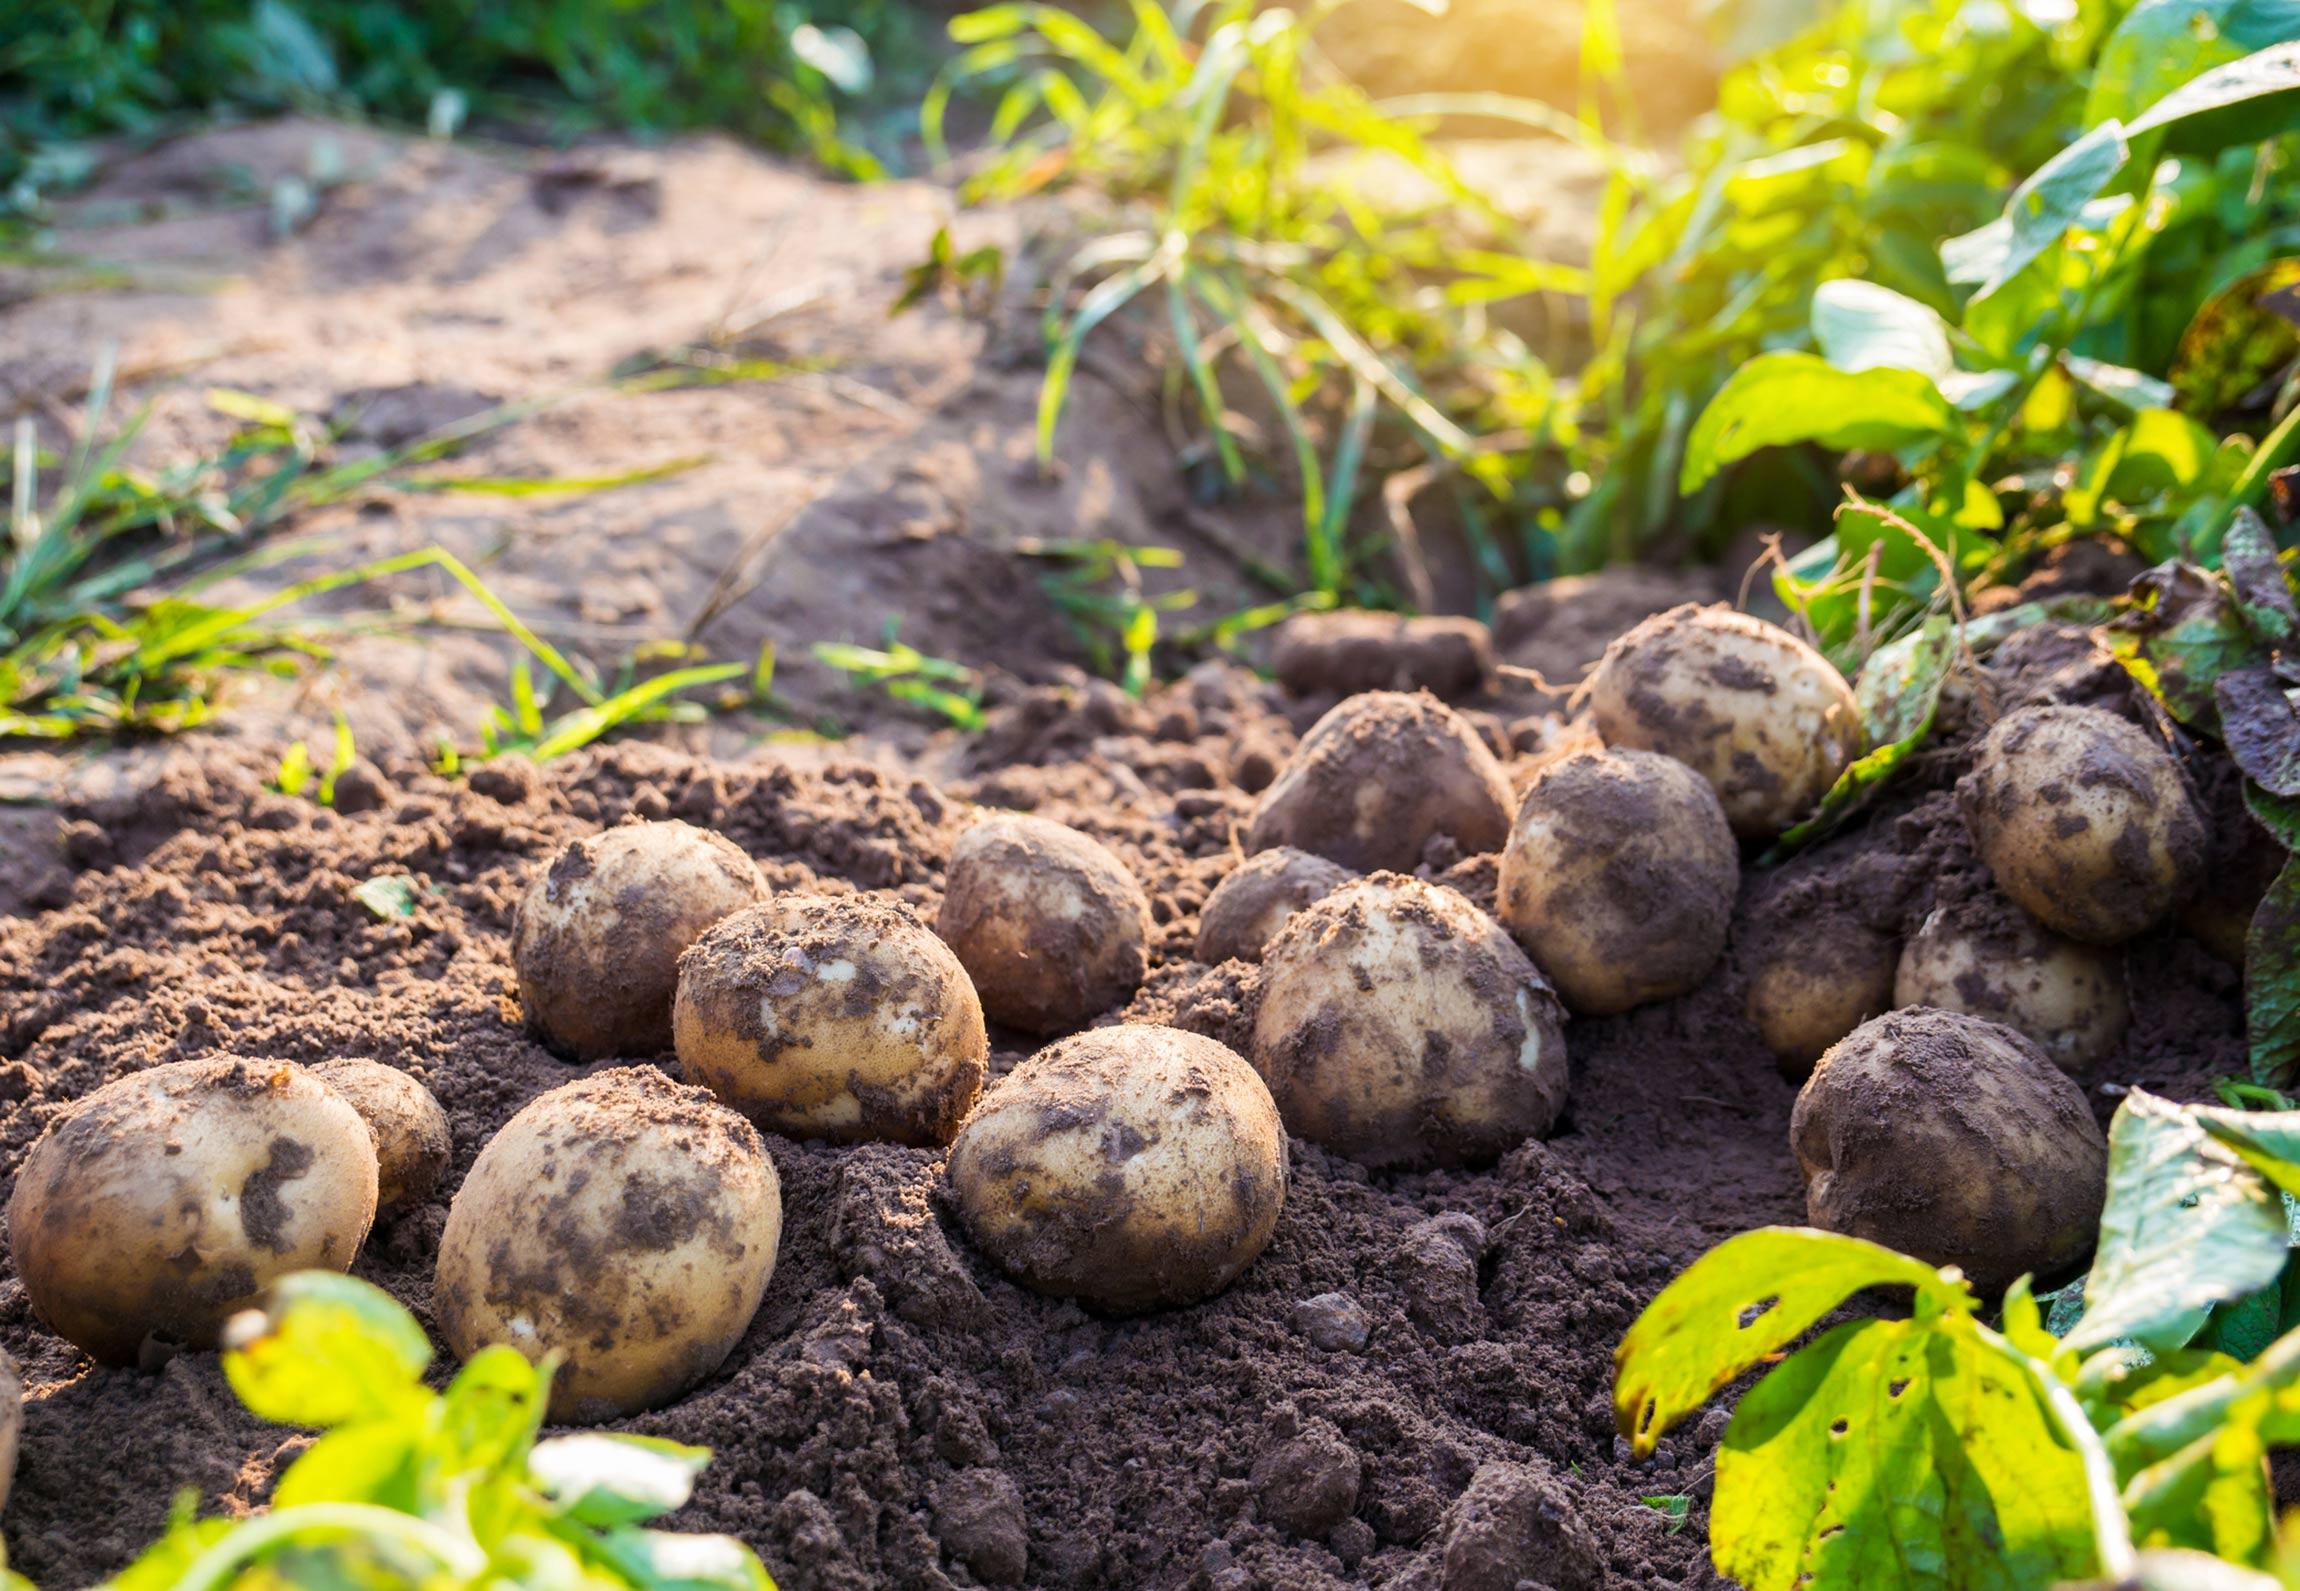 Potato nutrition: are potatoes healthy?